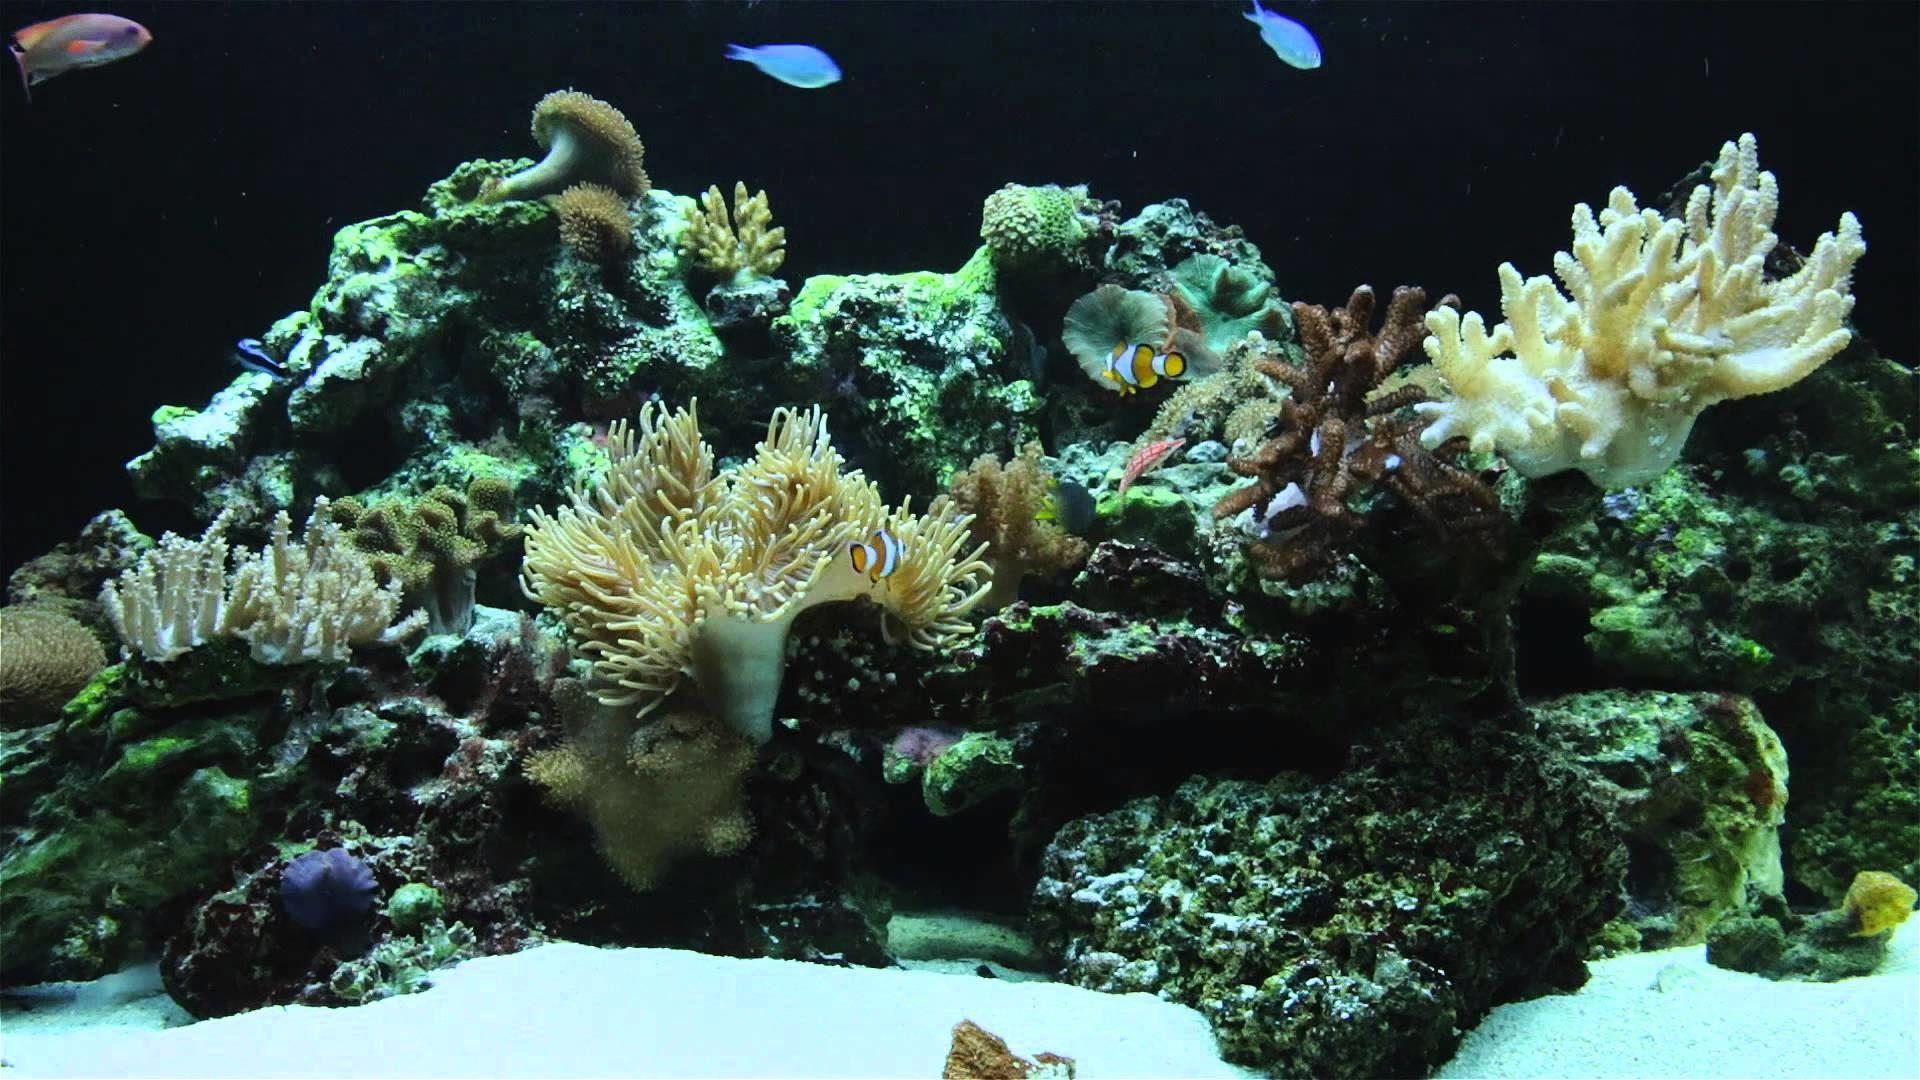 Full Size of Fish Tank Maxresdefault Fish Tank Screensaver Free With  Soundfish Windows Live Downloadfish Fish …